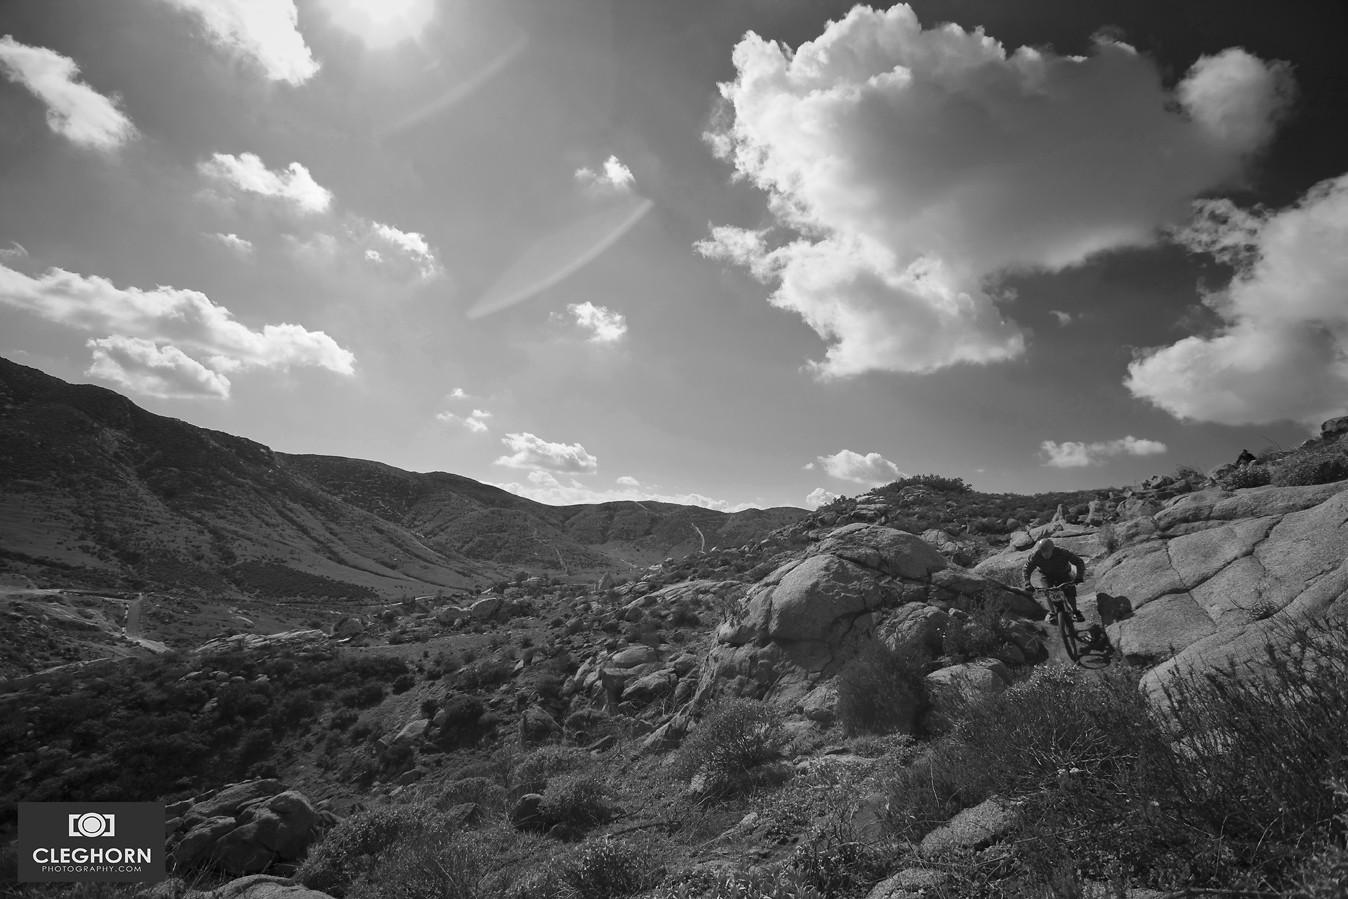 Super D - Cleghorn Photography - Mountain Biking Pictures - Vital MTB